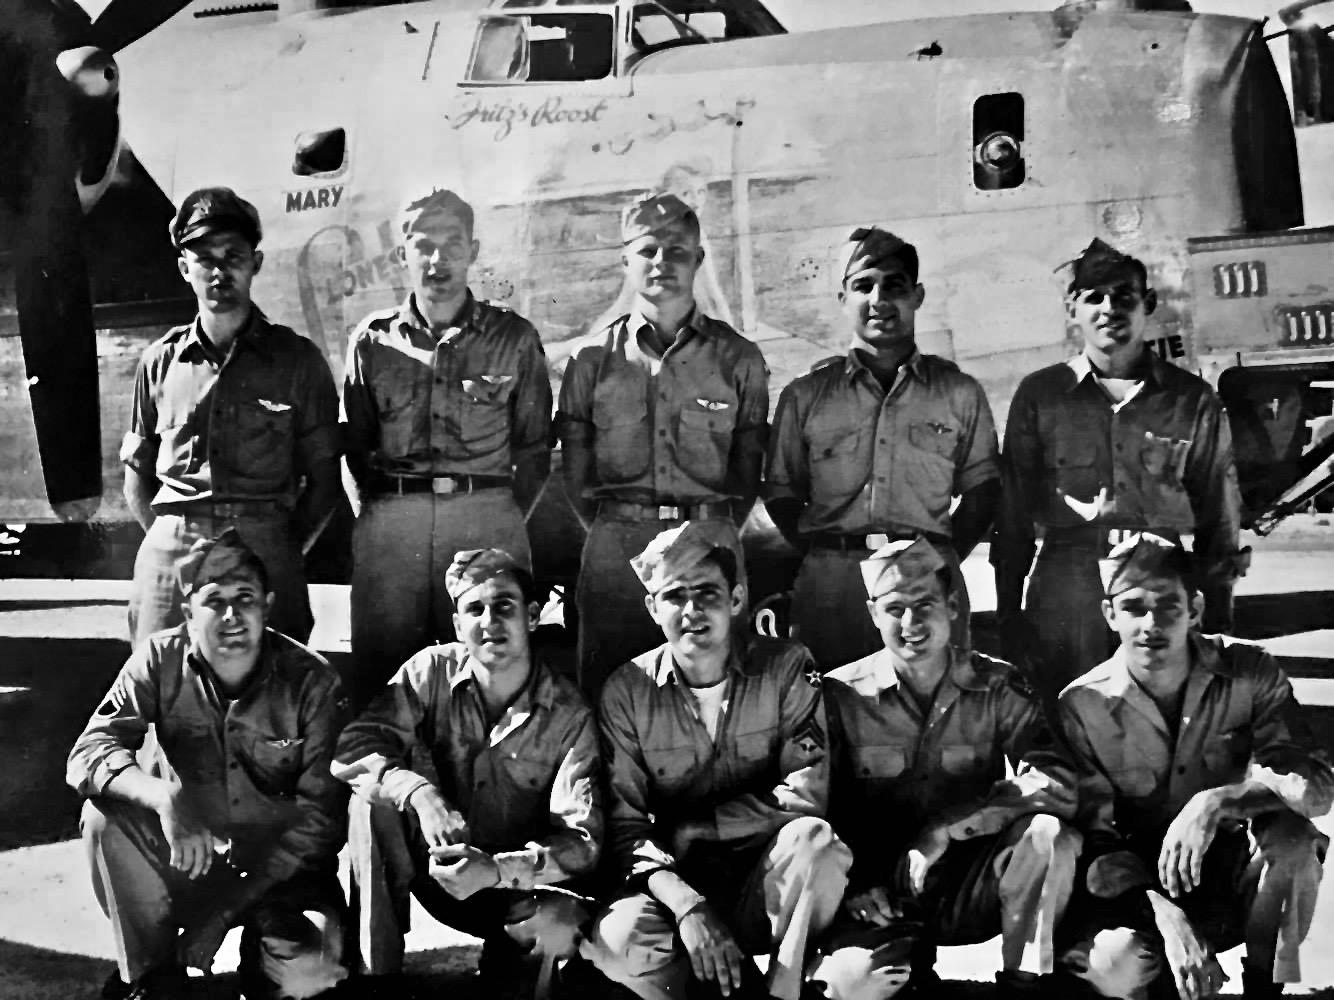 Turek Crew - Turek's Crew #39. Standing, left to right: Lt. Emil M. Turek, Lt. Francis